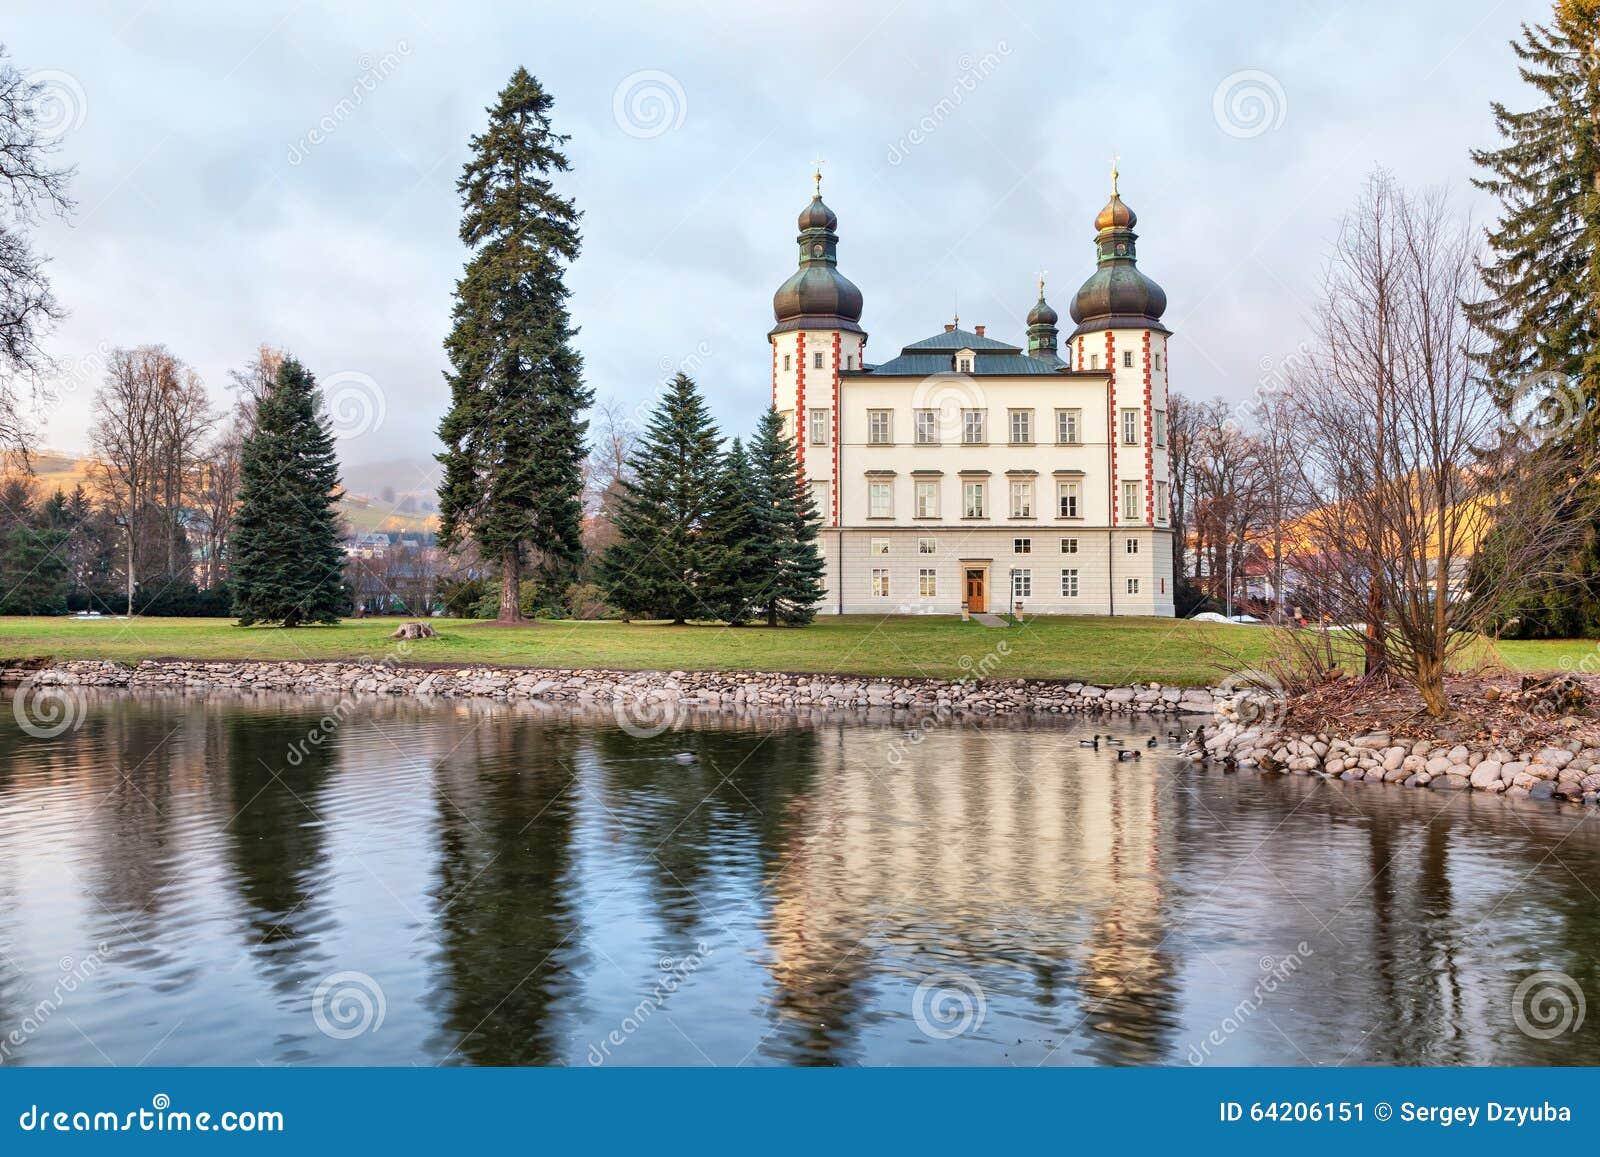 Castillo de Vrchlabi que refleja en la charca